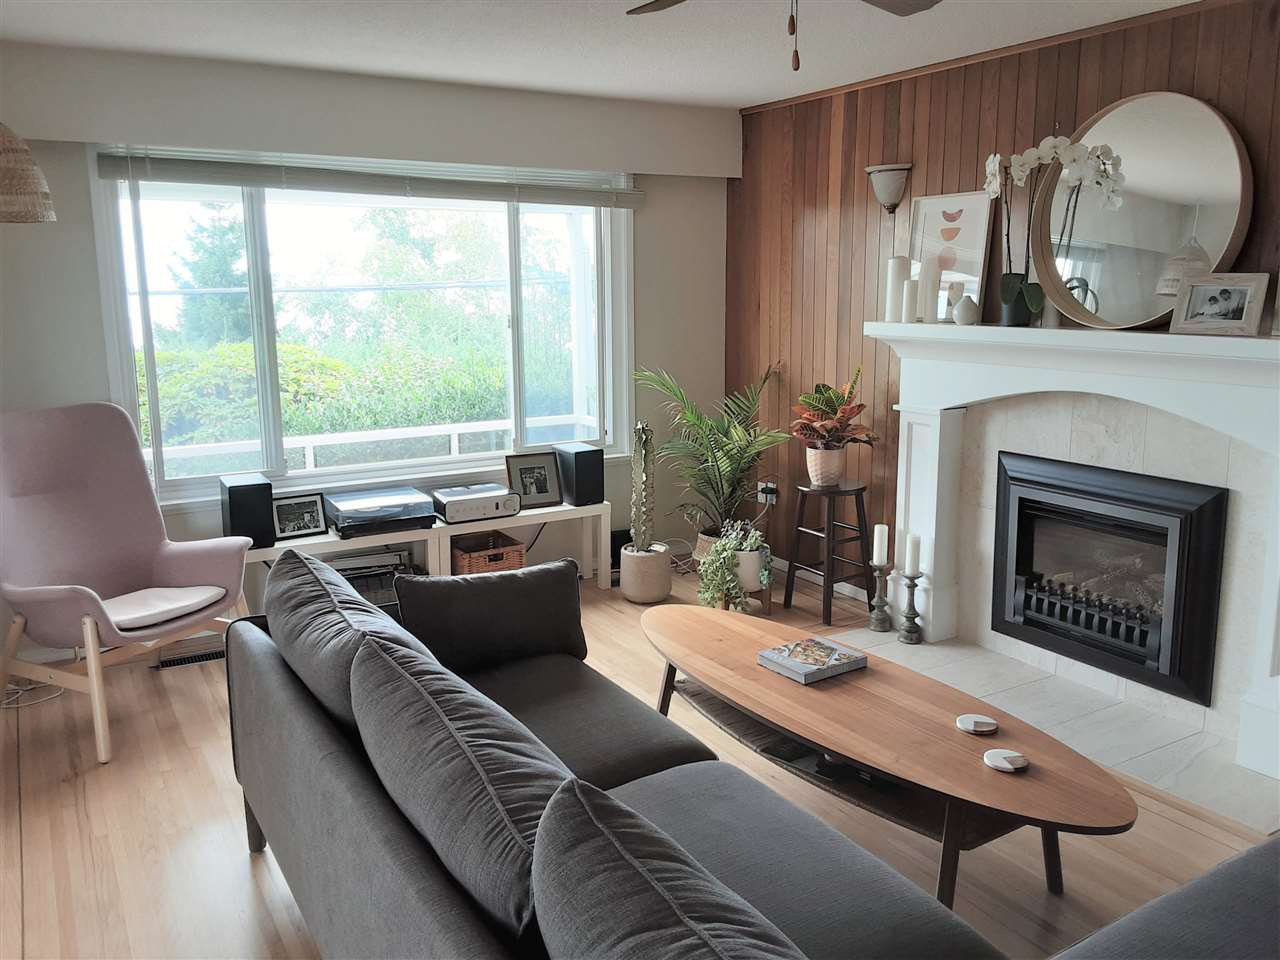 Photo 11: Photos: 15291 COLUMBIA Avenue: White Rock House for sale (South Surrey White Rock)  : MLS®# R2492863